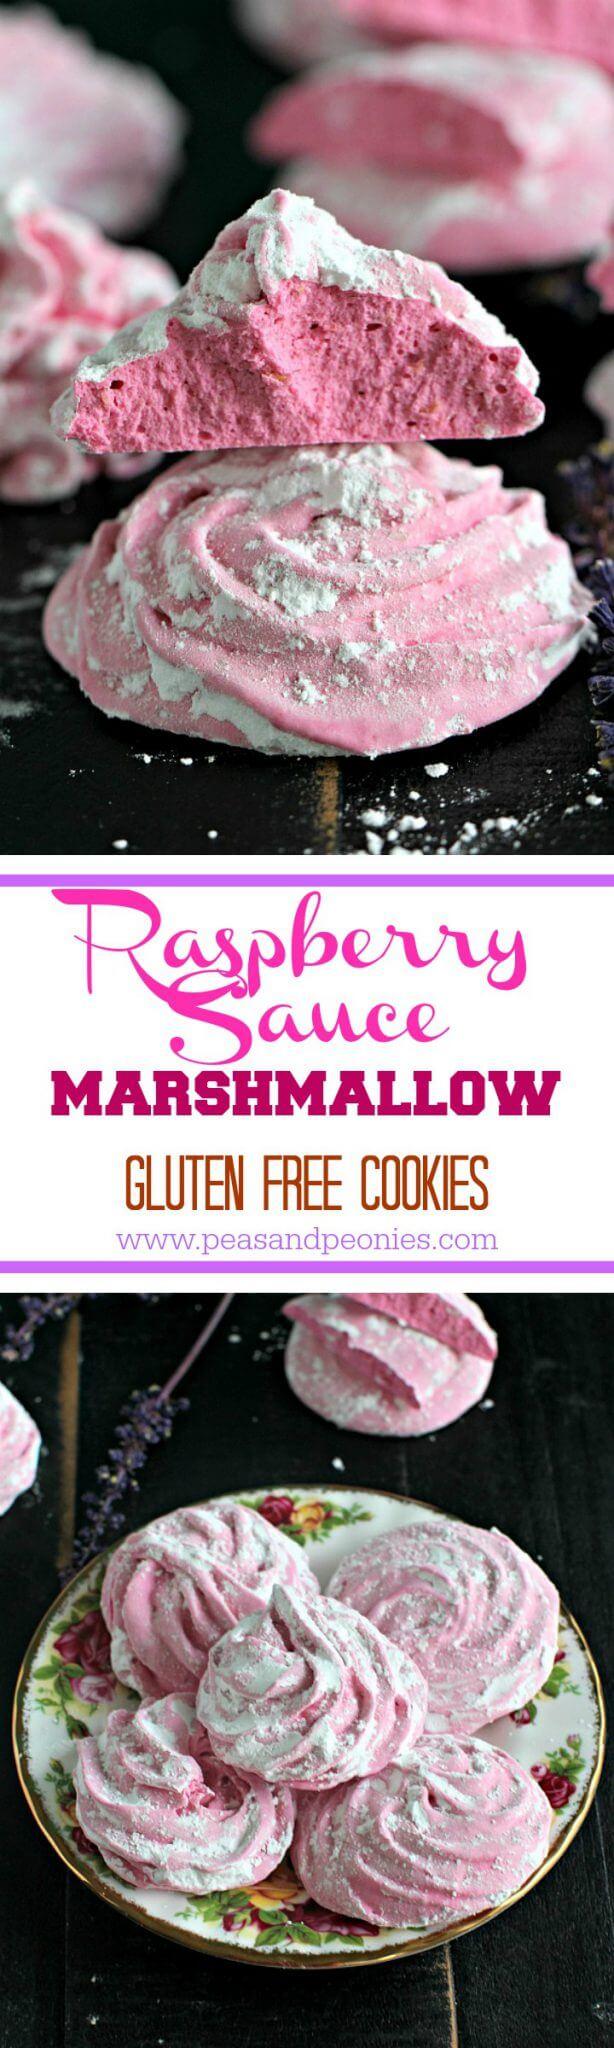 raspberry marshmallow cookies